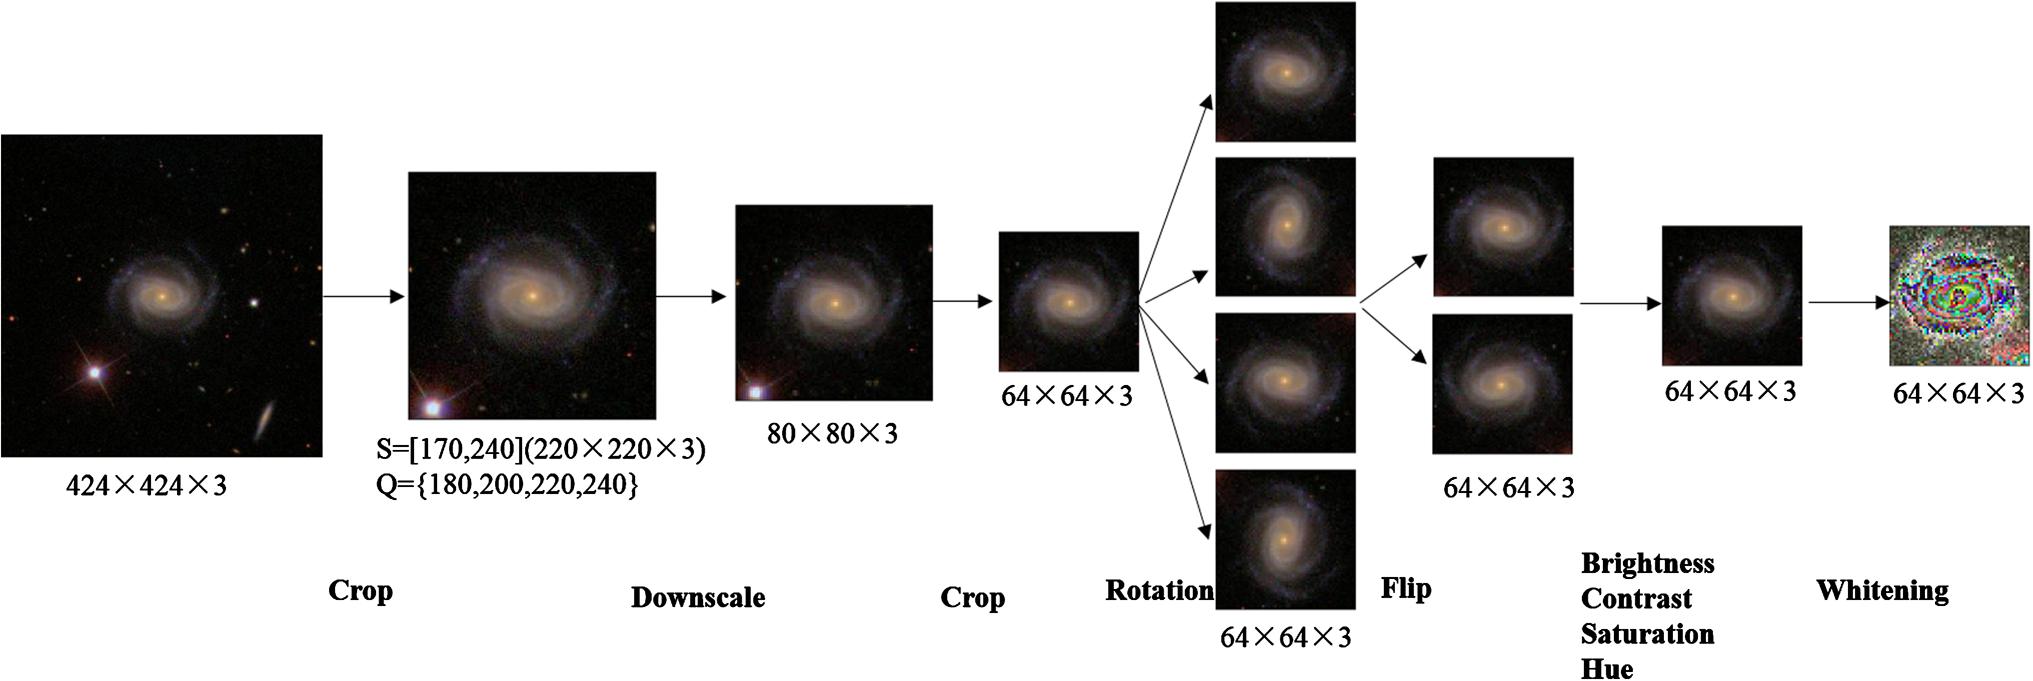 Galaxy morphology classification with deep convolutional